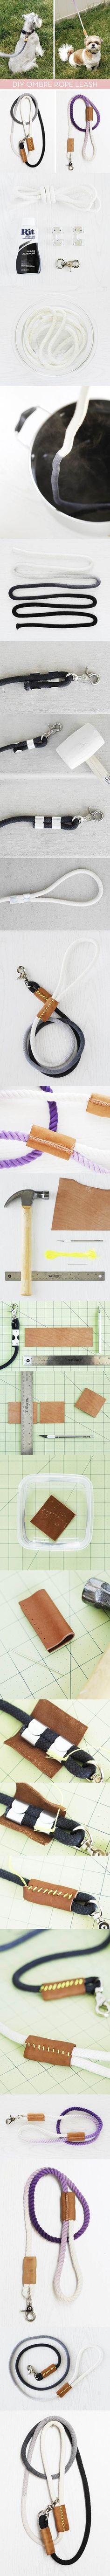 DIY Modern Dip-Dyed Rope Dog Leash 2